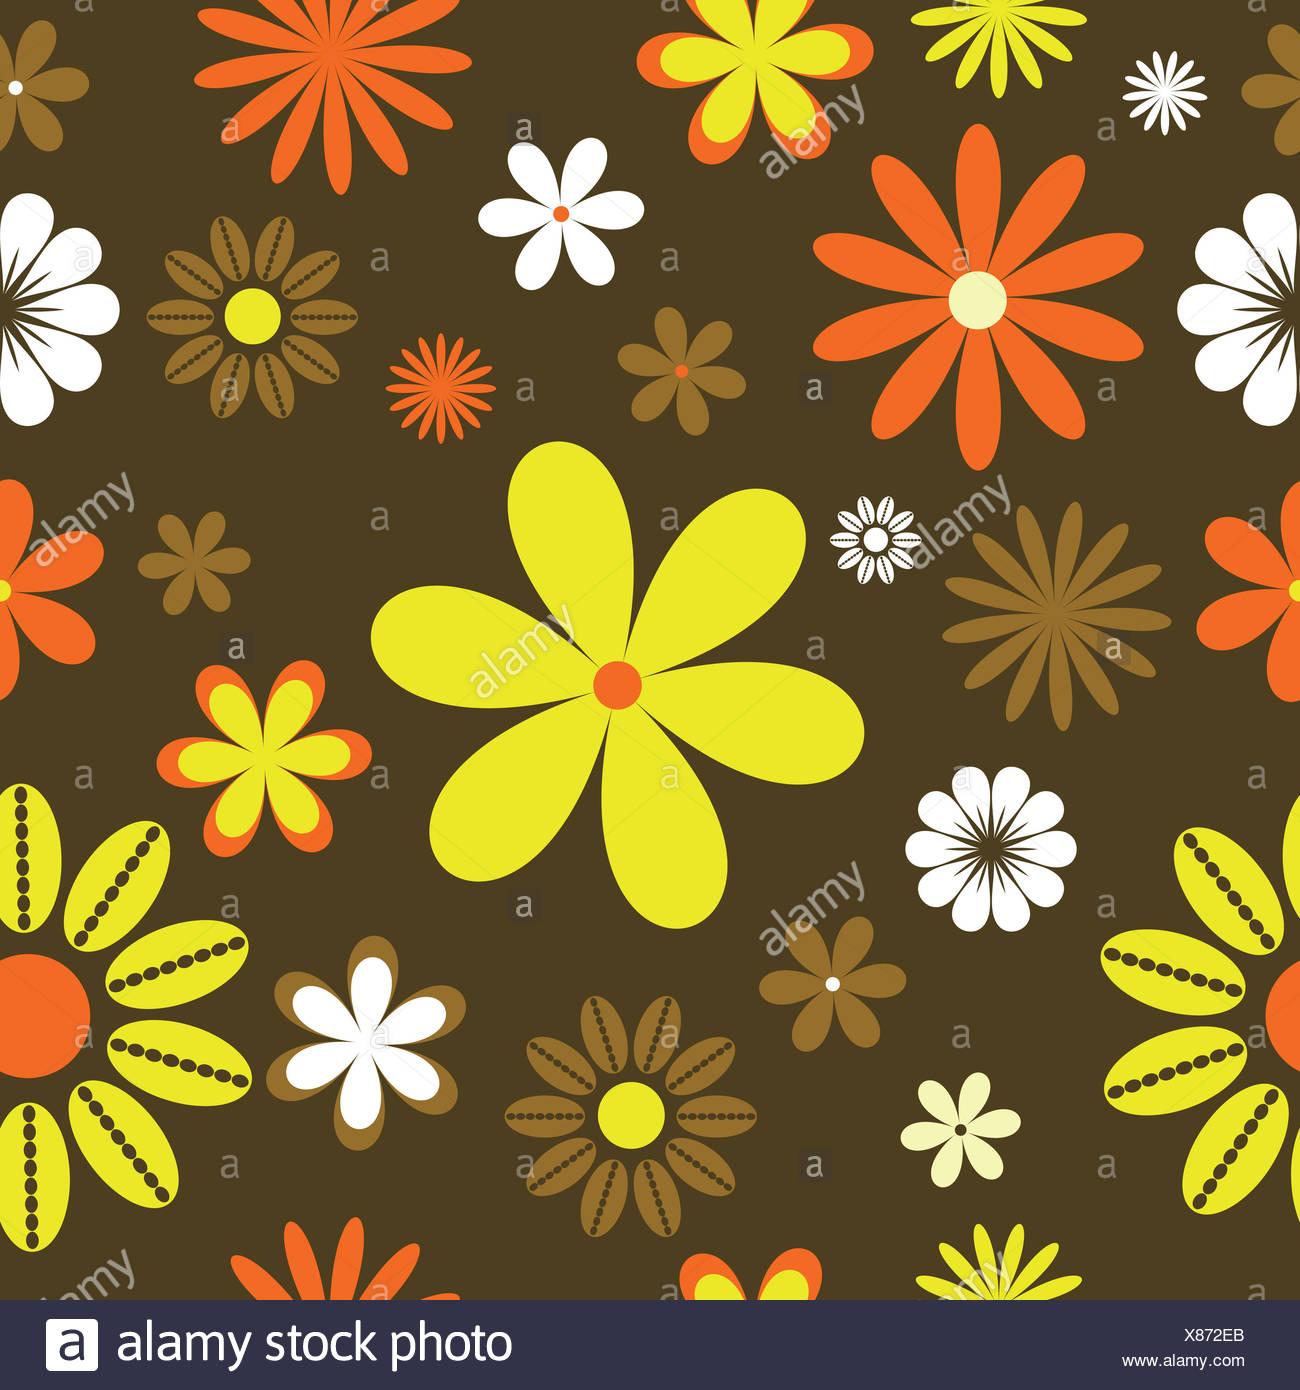 Fleur Plante Resume Papier Peint Retro Tile Seamless Vector Toile